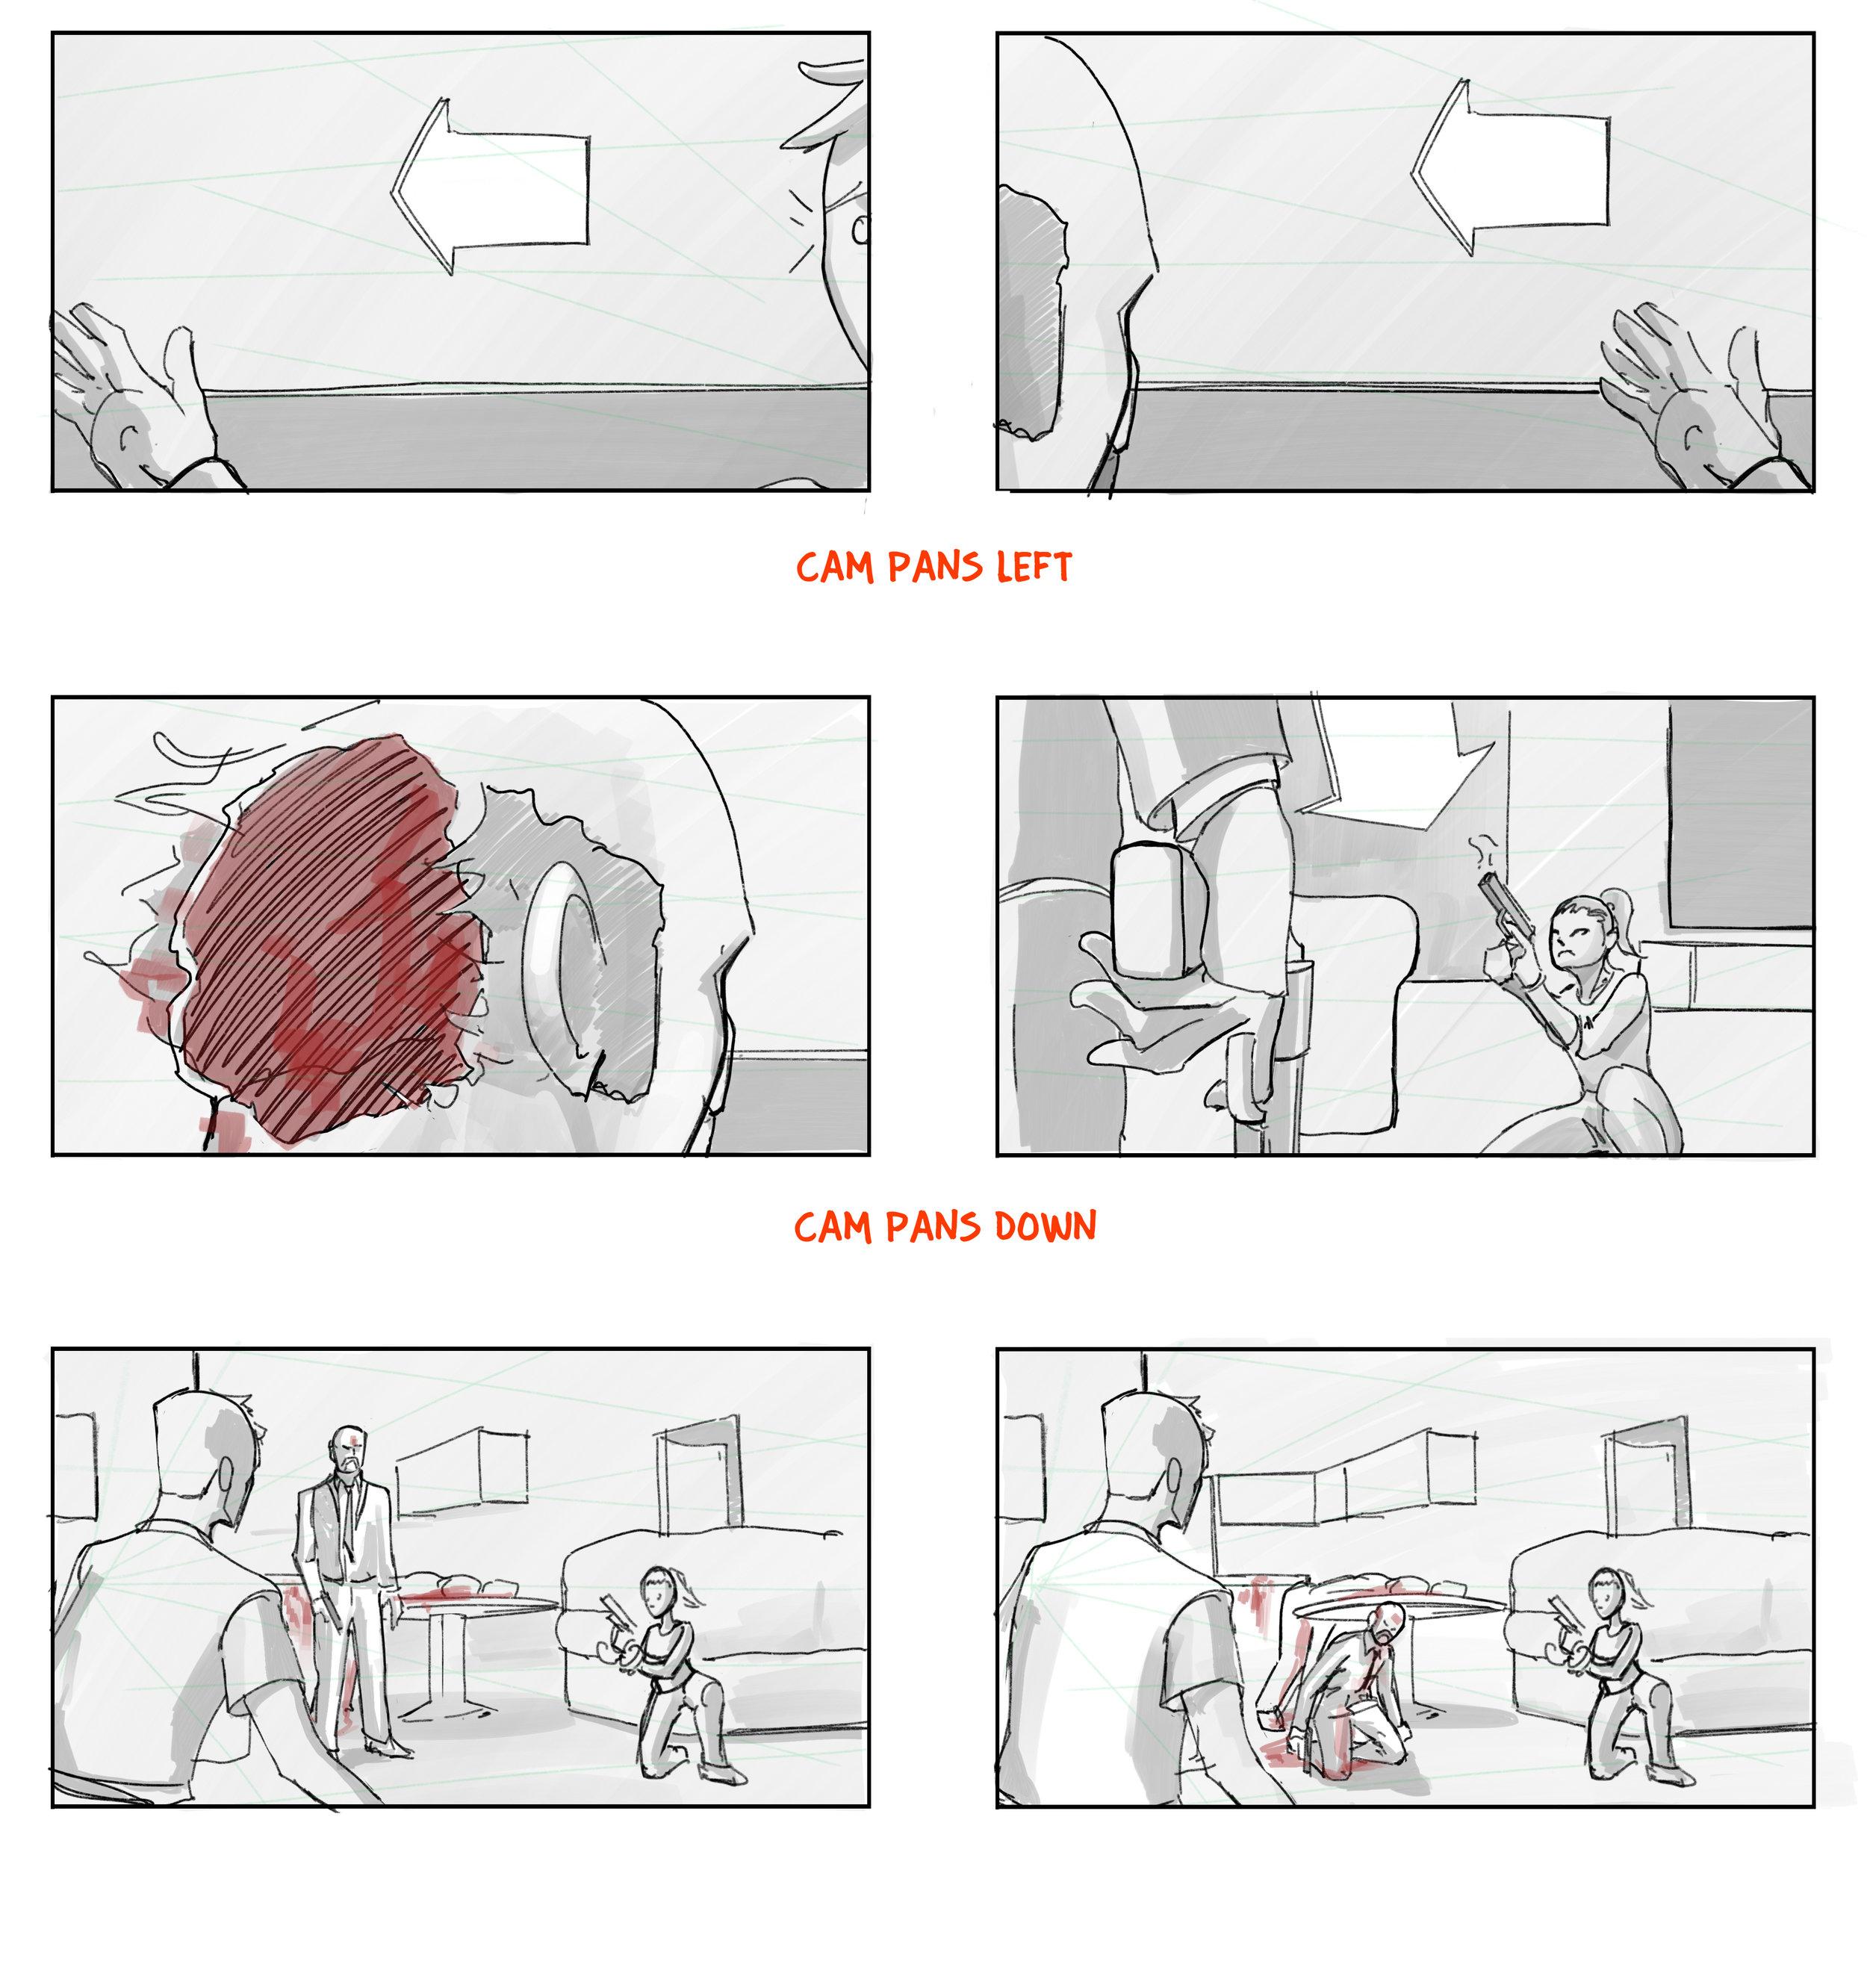 SAM_BS_Catapano_Storyboards_018.jpg